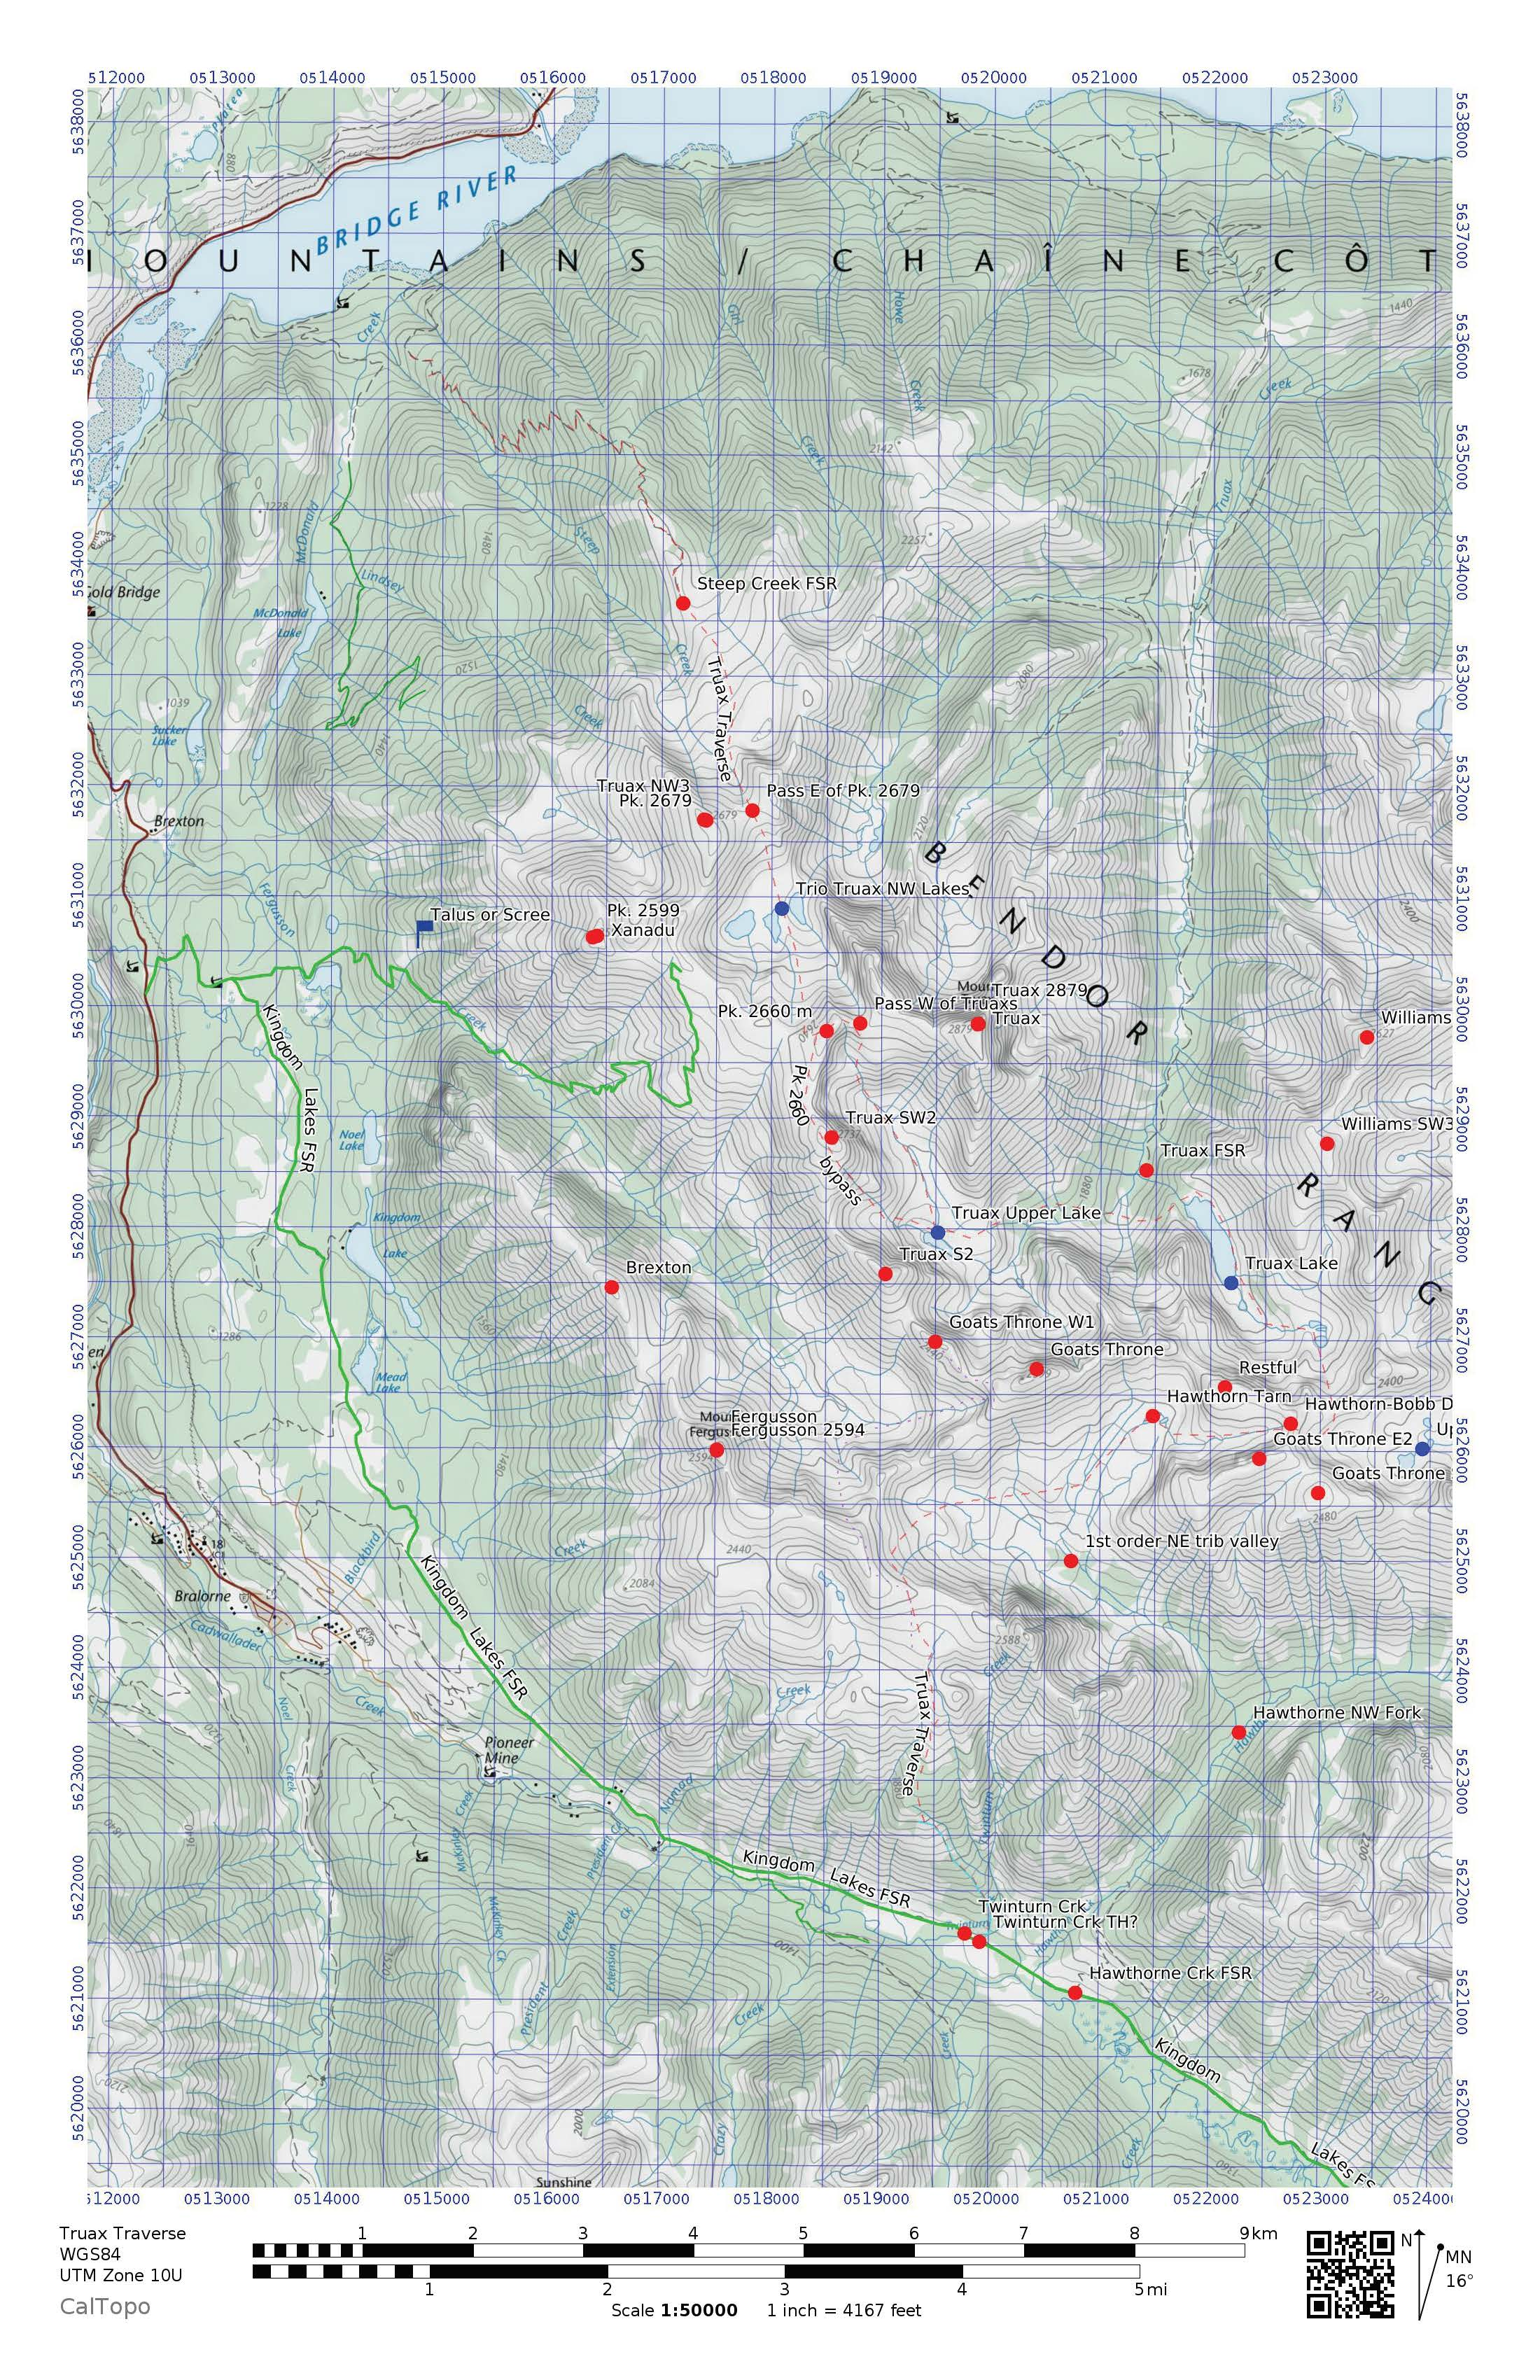 Route map by Elliott Skierszkan.